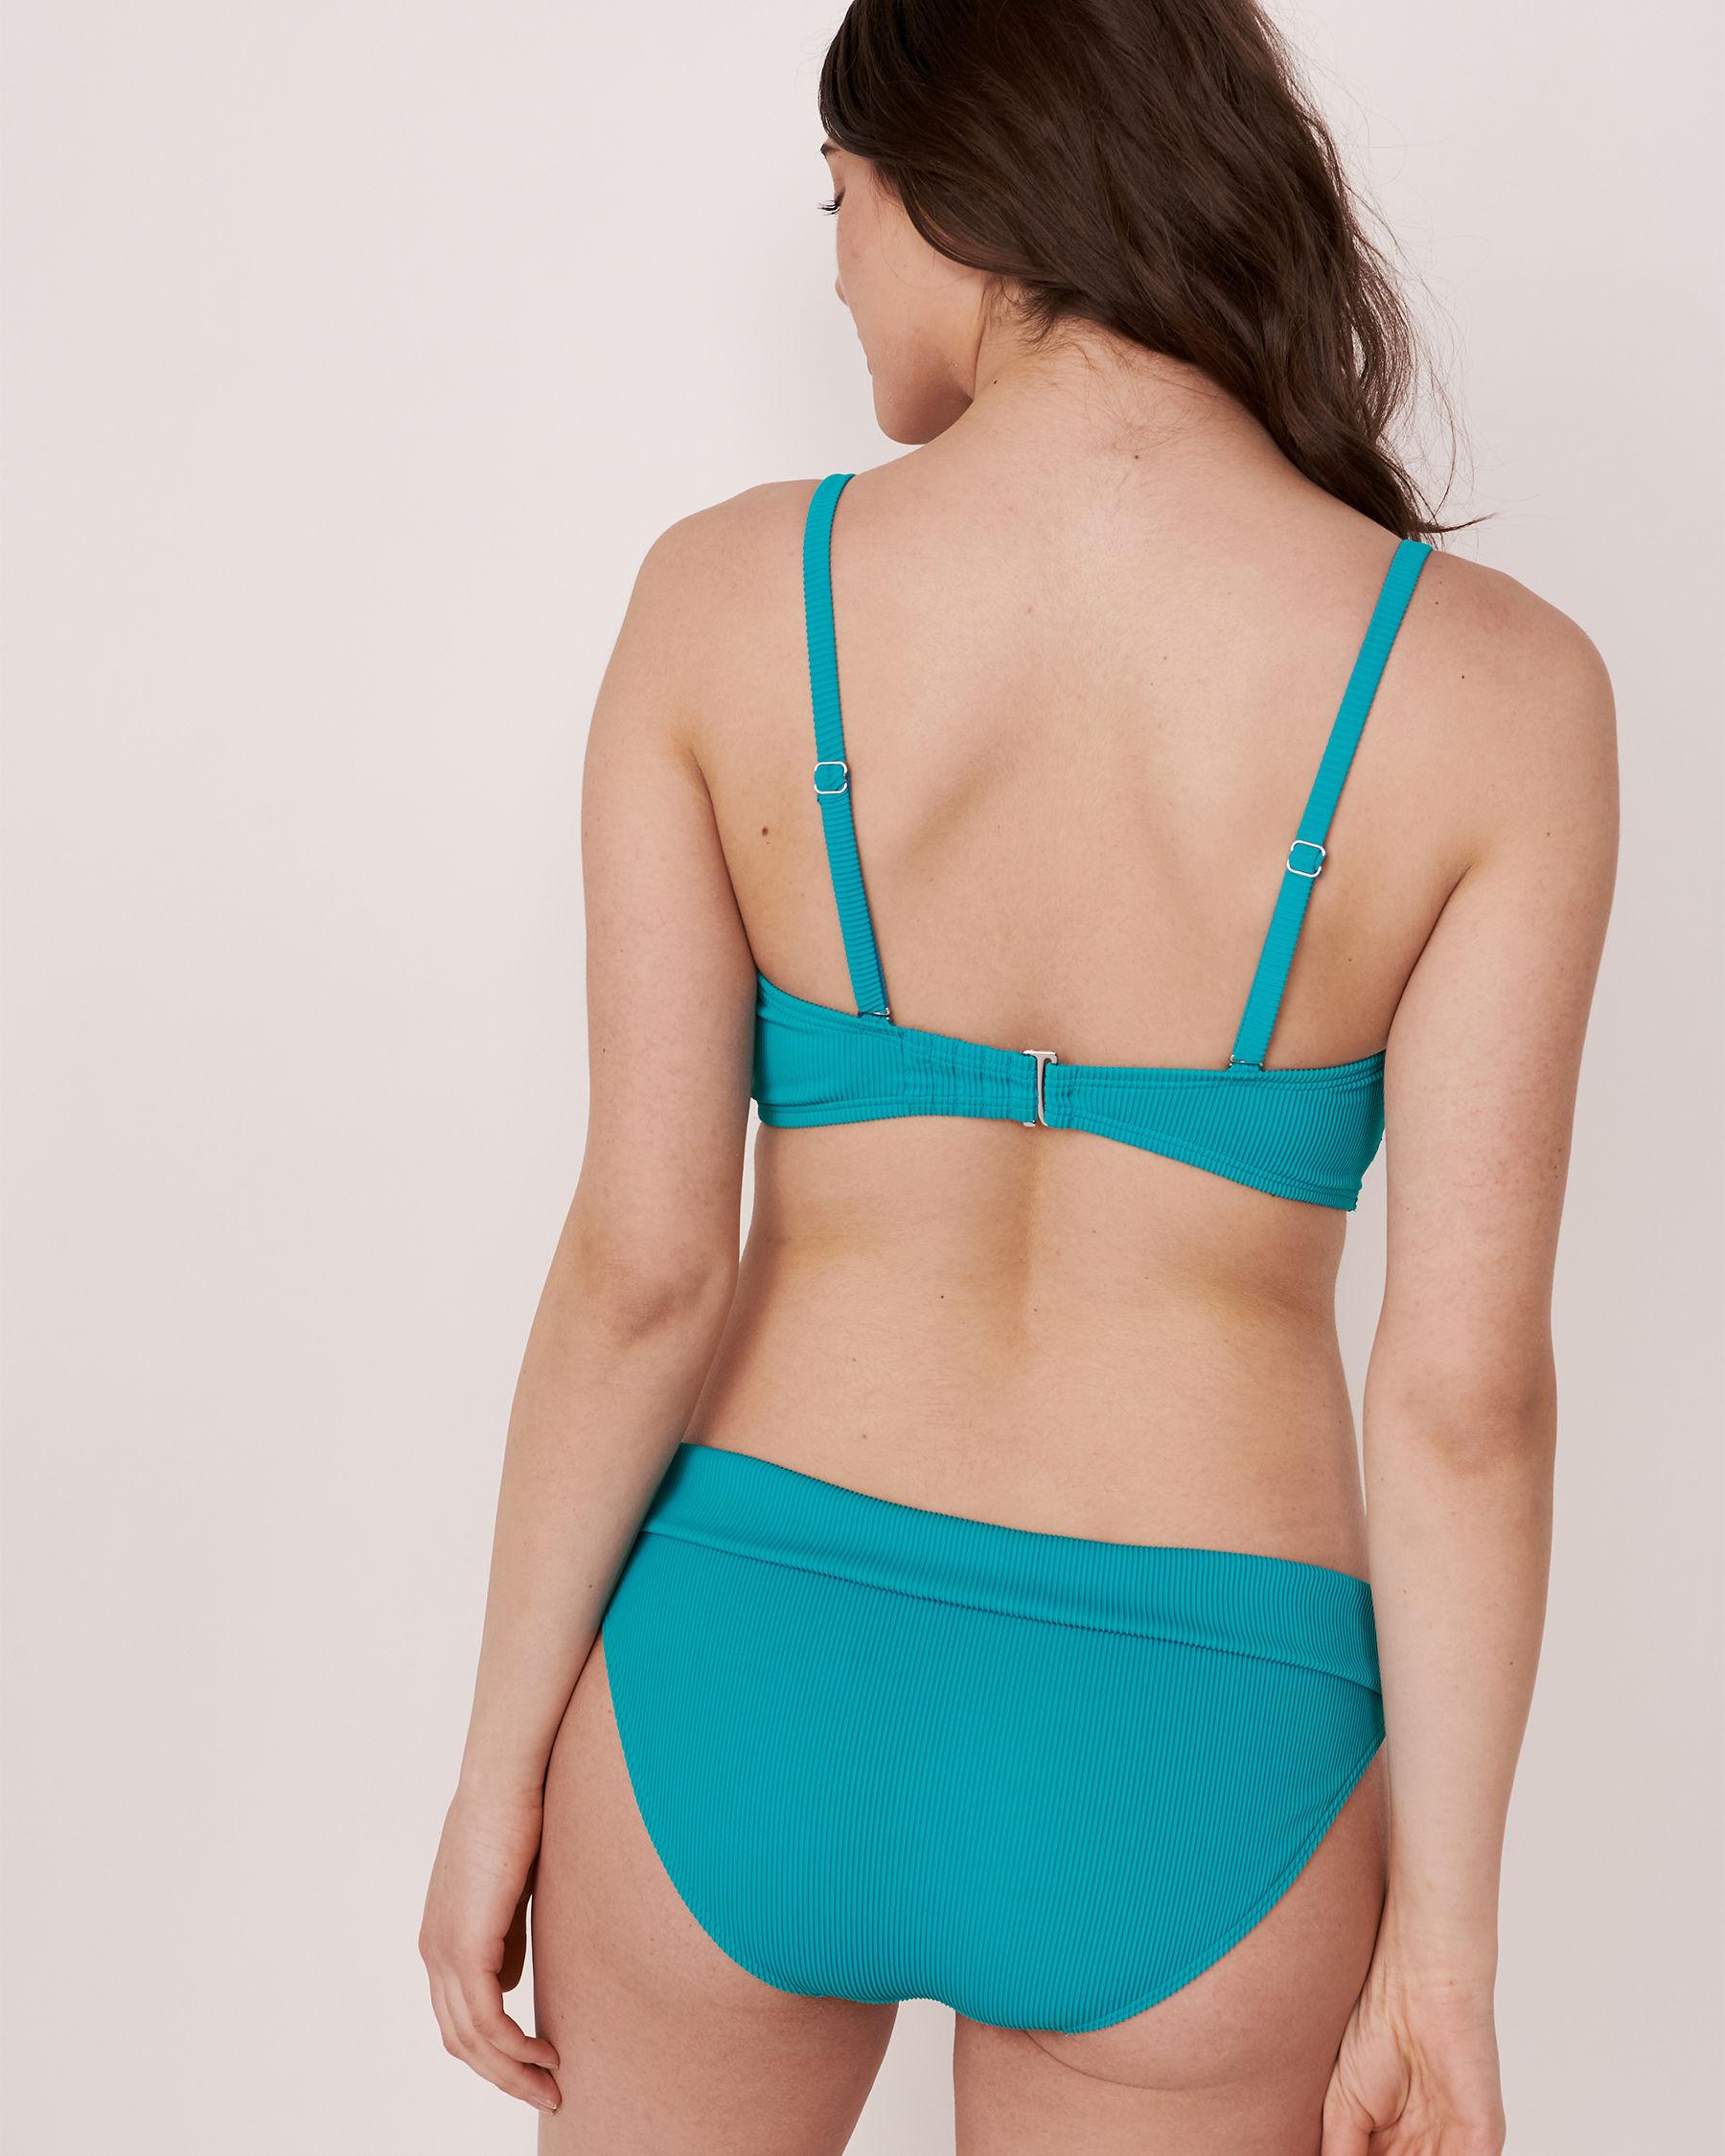 LA VIE EN ROSE AQUA TOOTSIE RIB Recycled Fibers D Cup Bandeau Bikini Top Blue 70200010 - View3